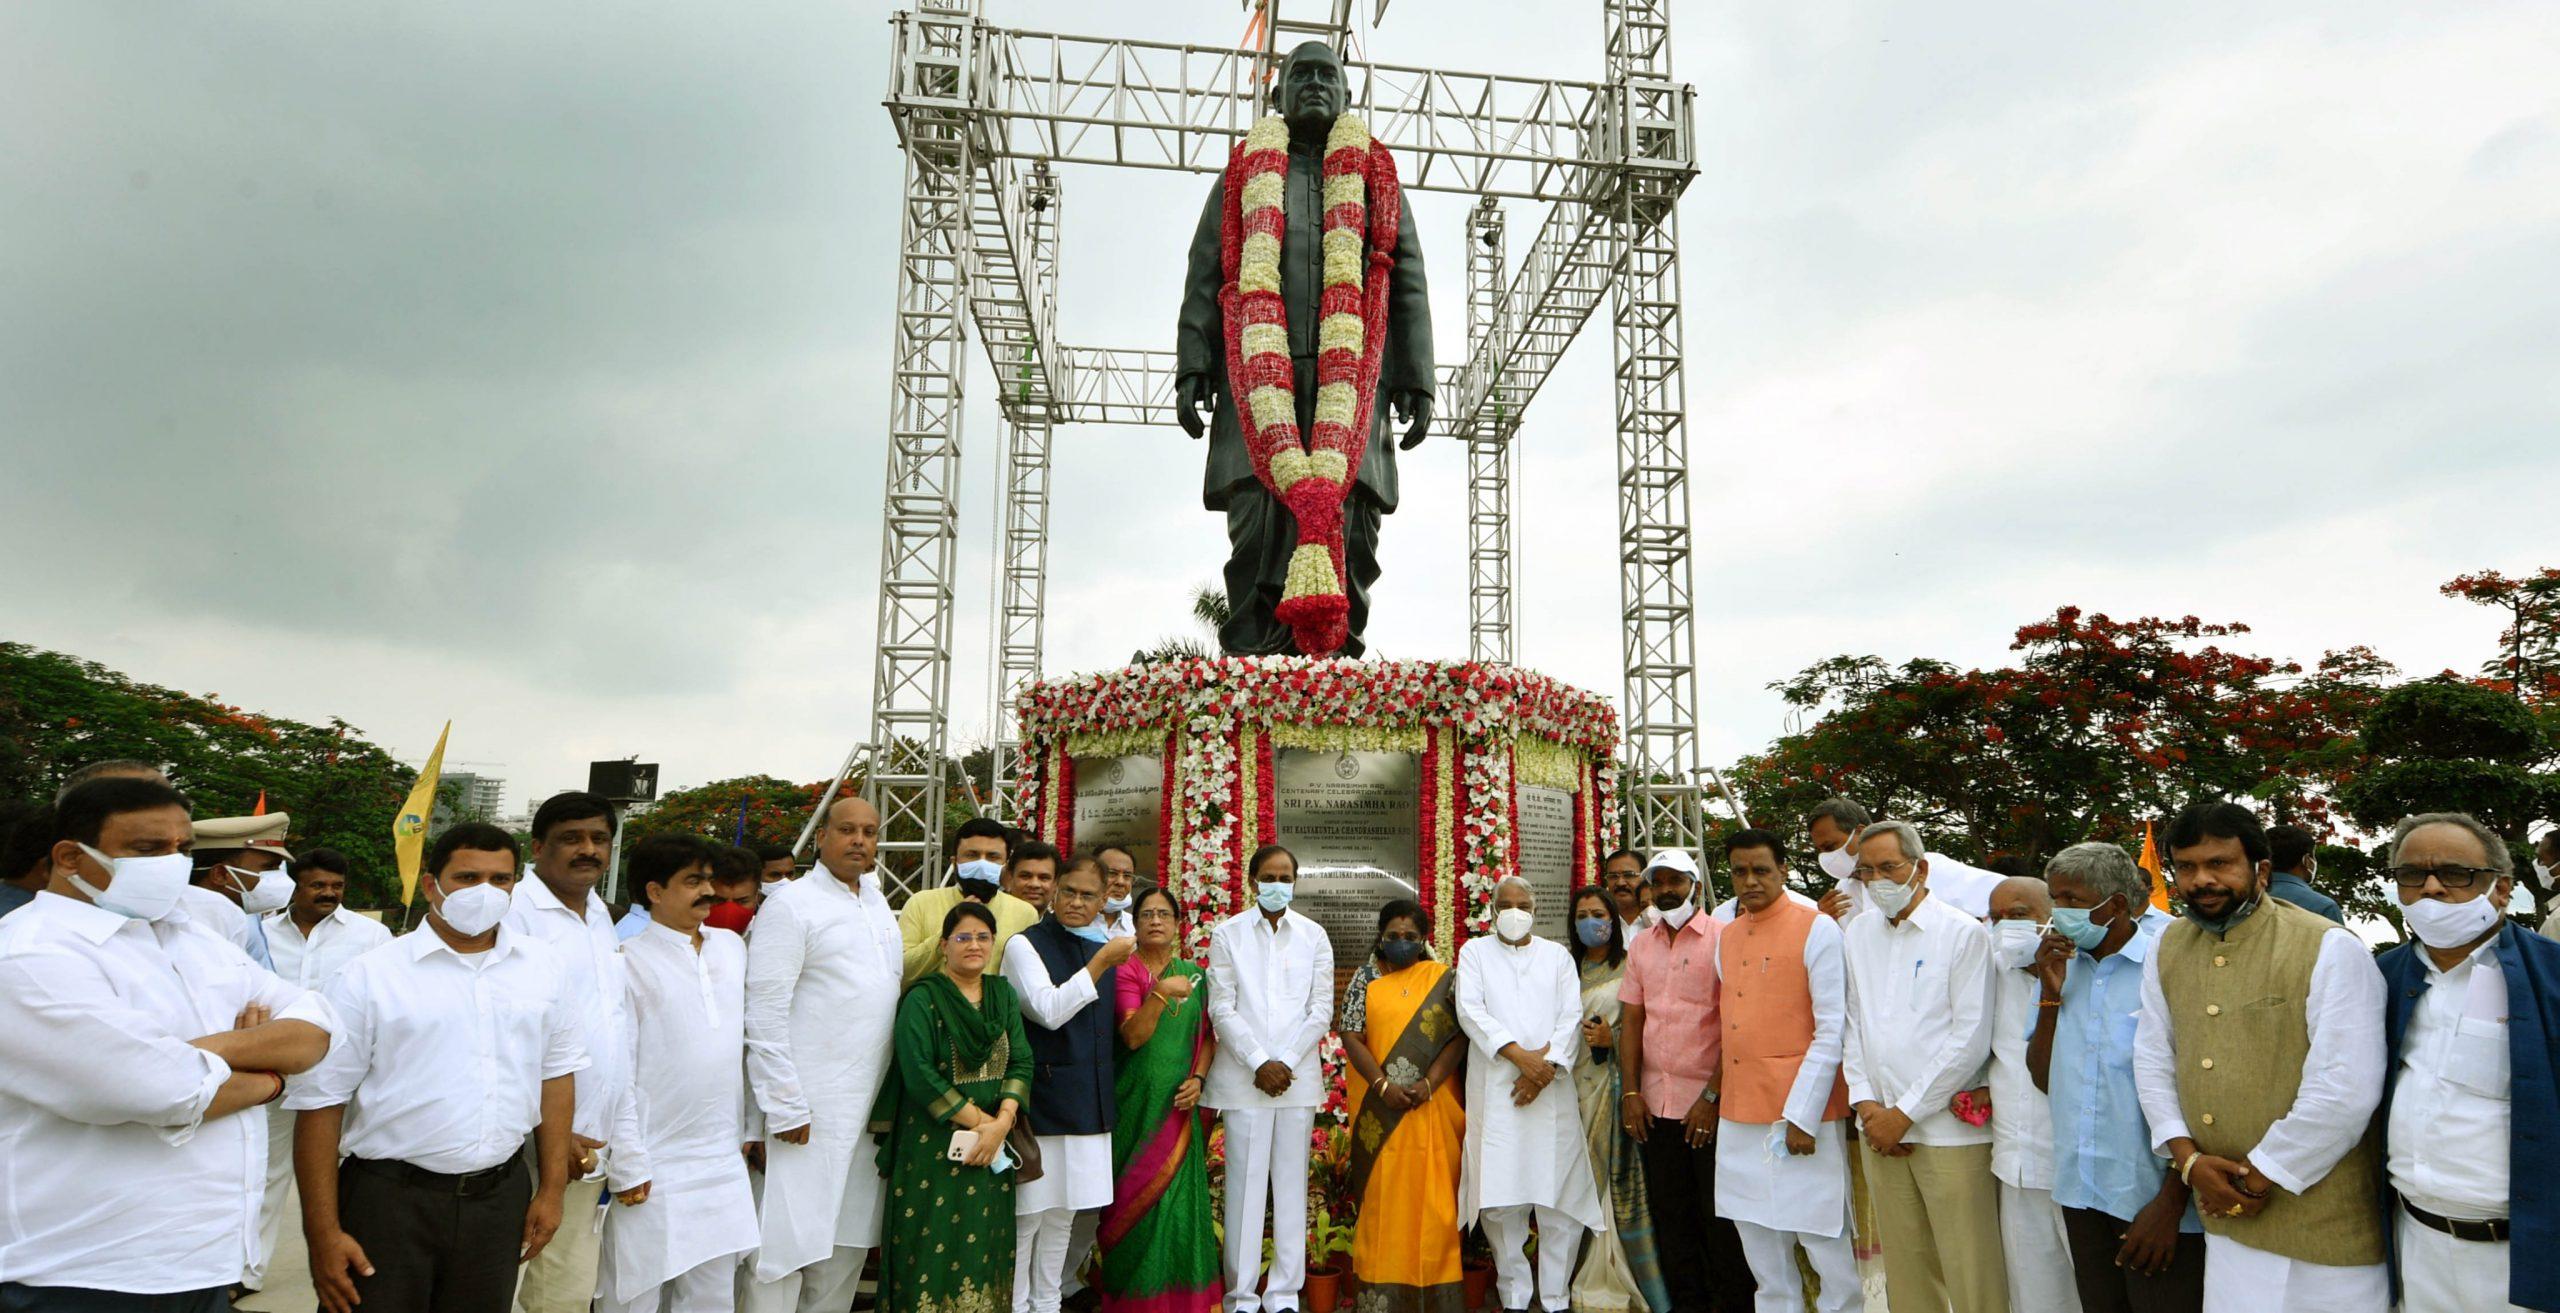 PVNR_Statue_Inauguration_1